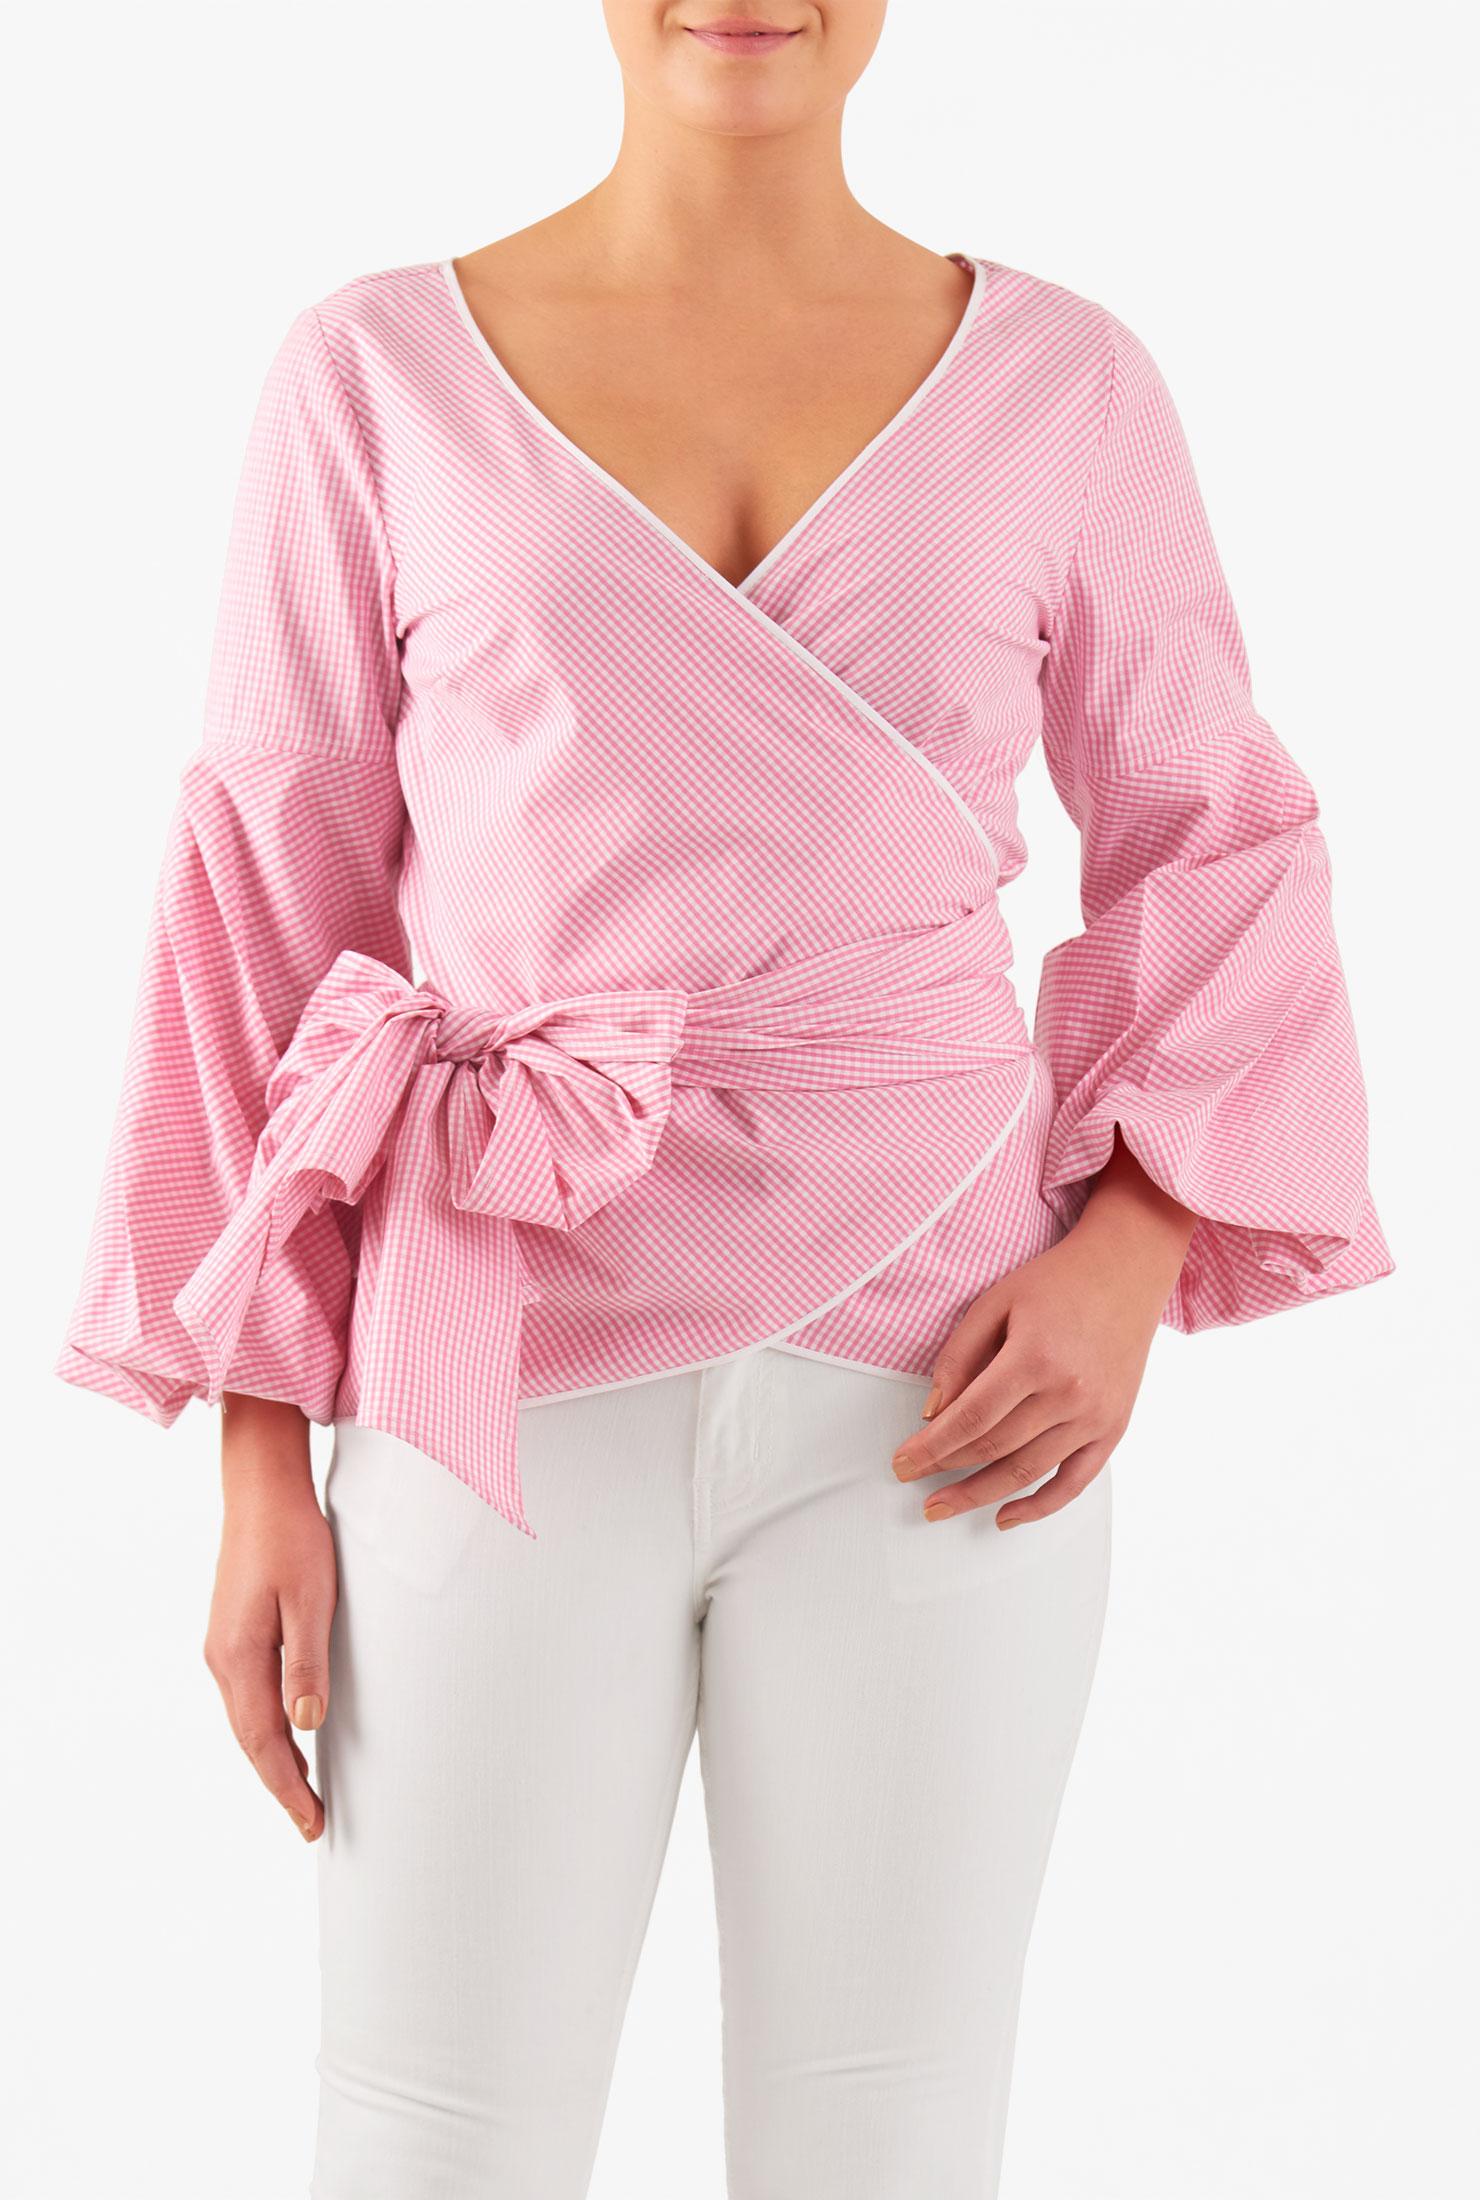 Eshakti Womens Sleeve Detail Oxford Gingham Wrap Blouse